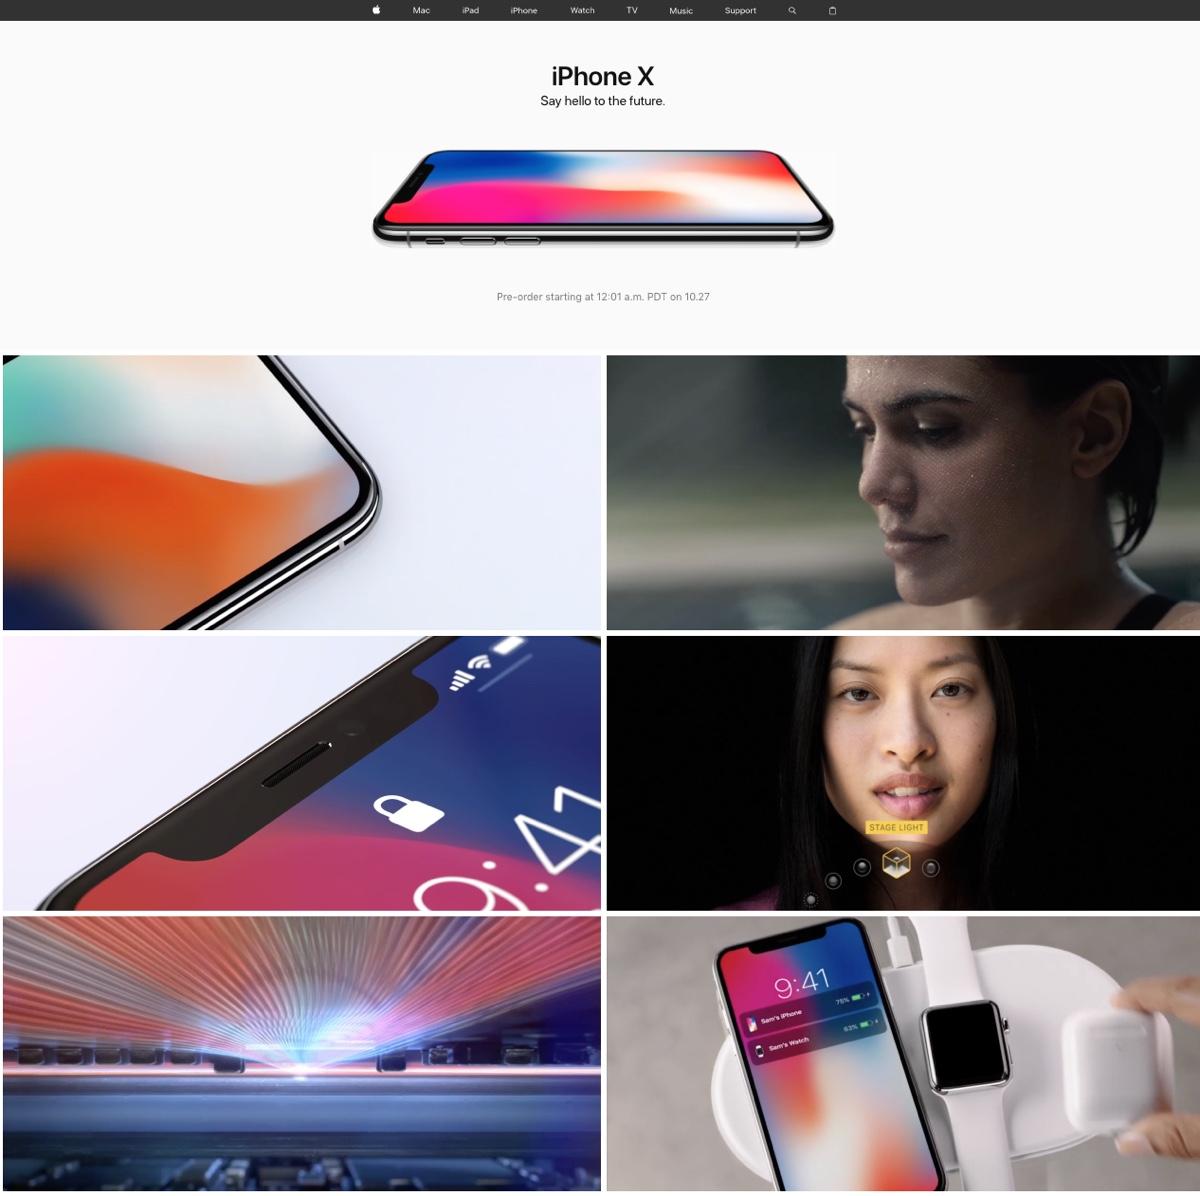 iphone x domina applecom